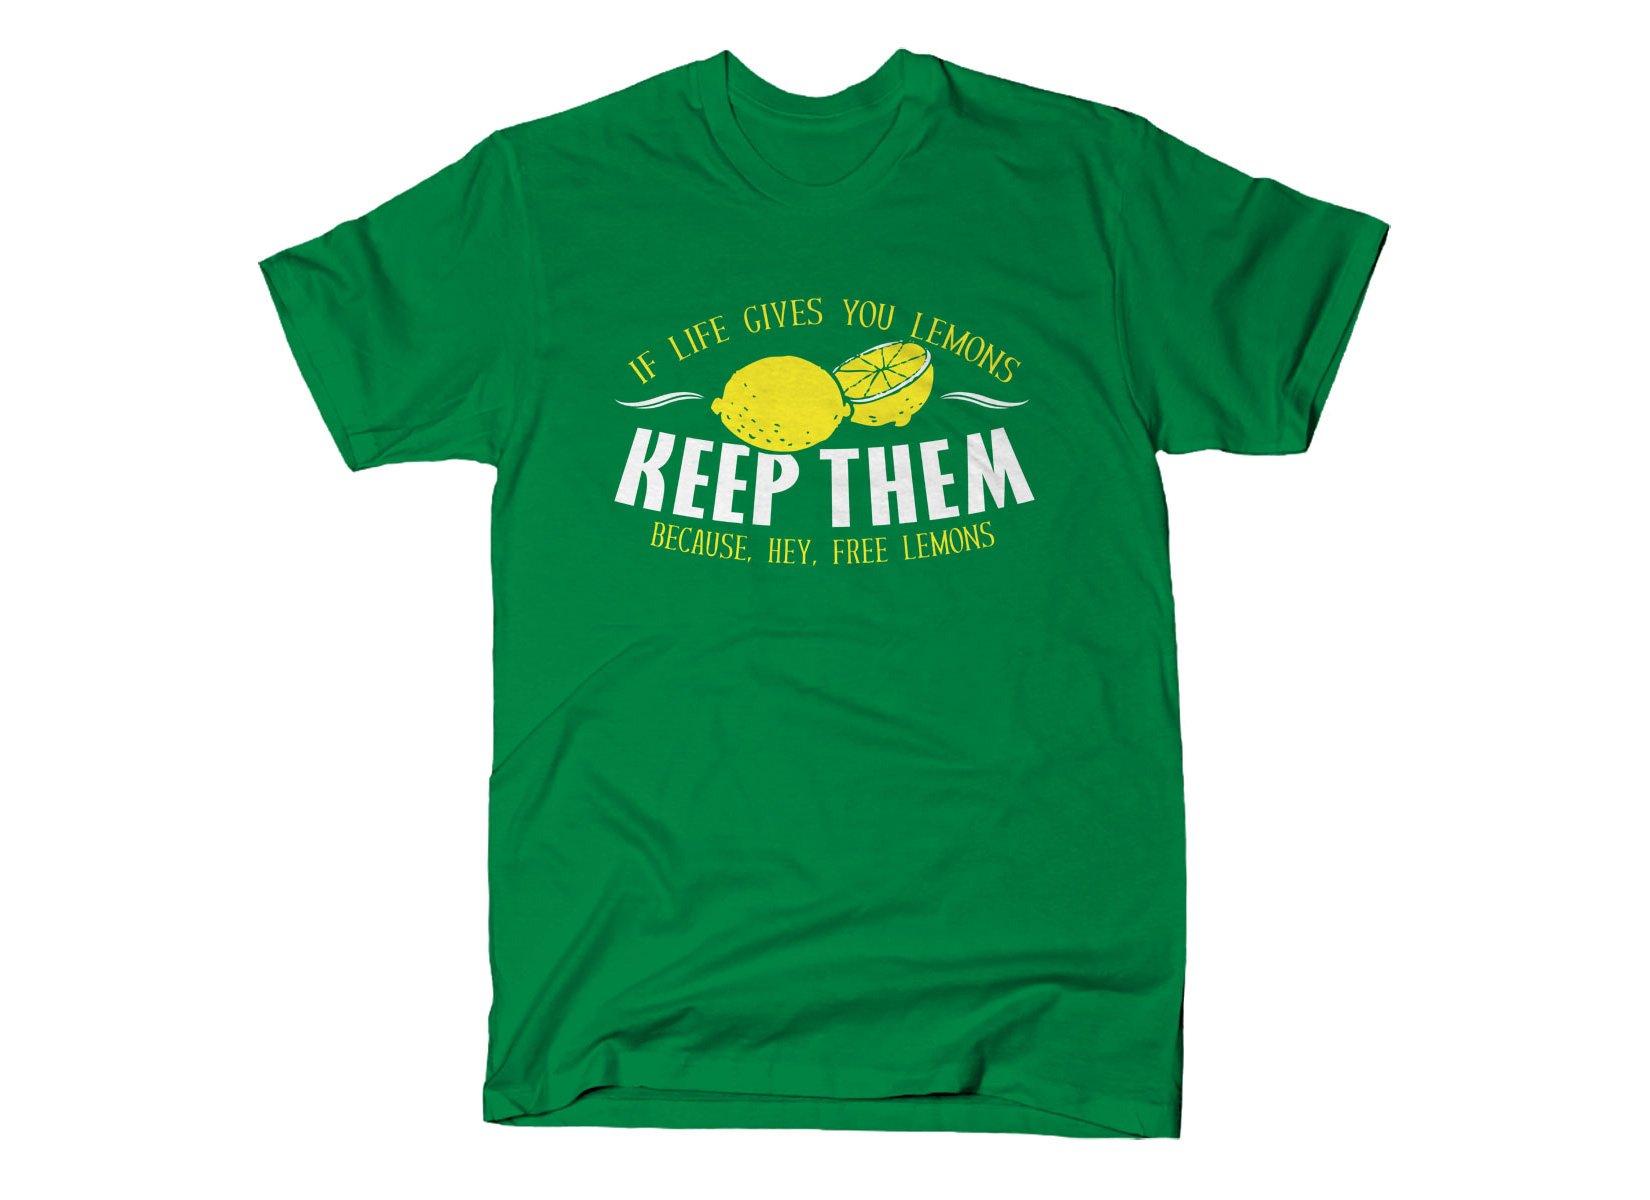 If Life Gives You Lemons on Mens T-Shirt